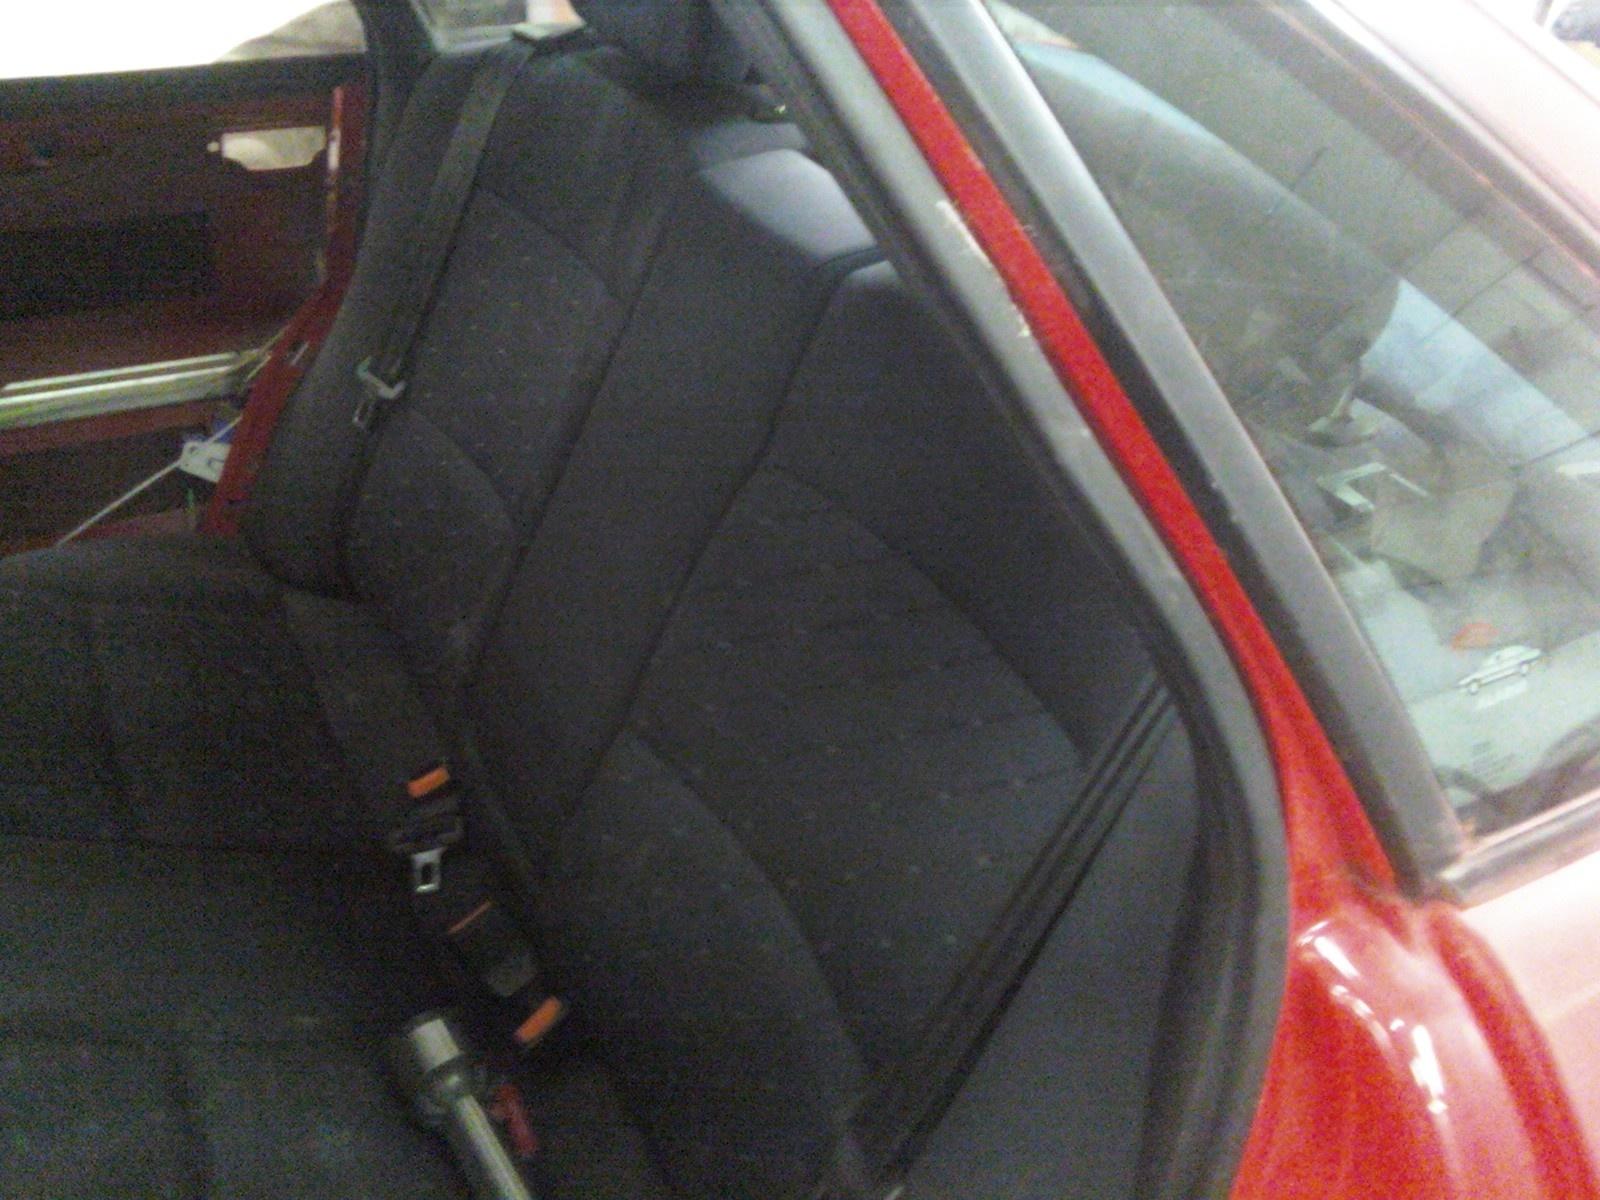 Audi Questions Rear Seats CarGurus - Audi car seat